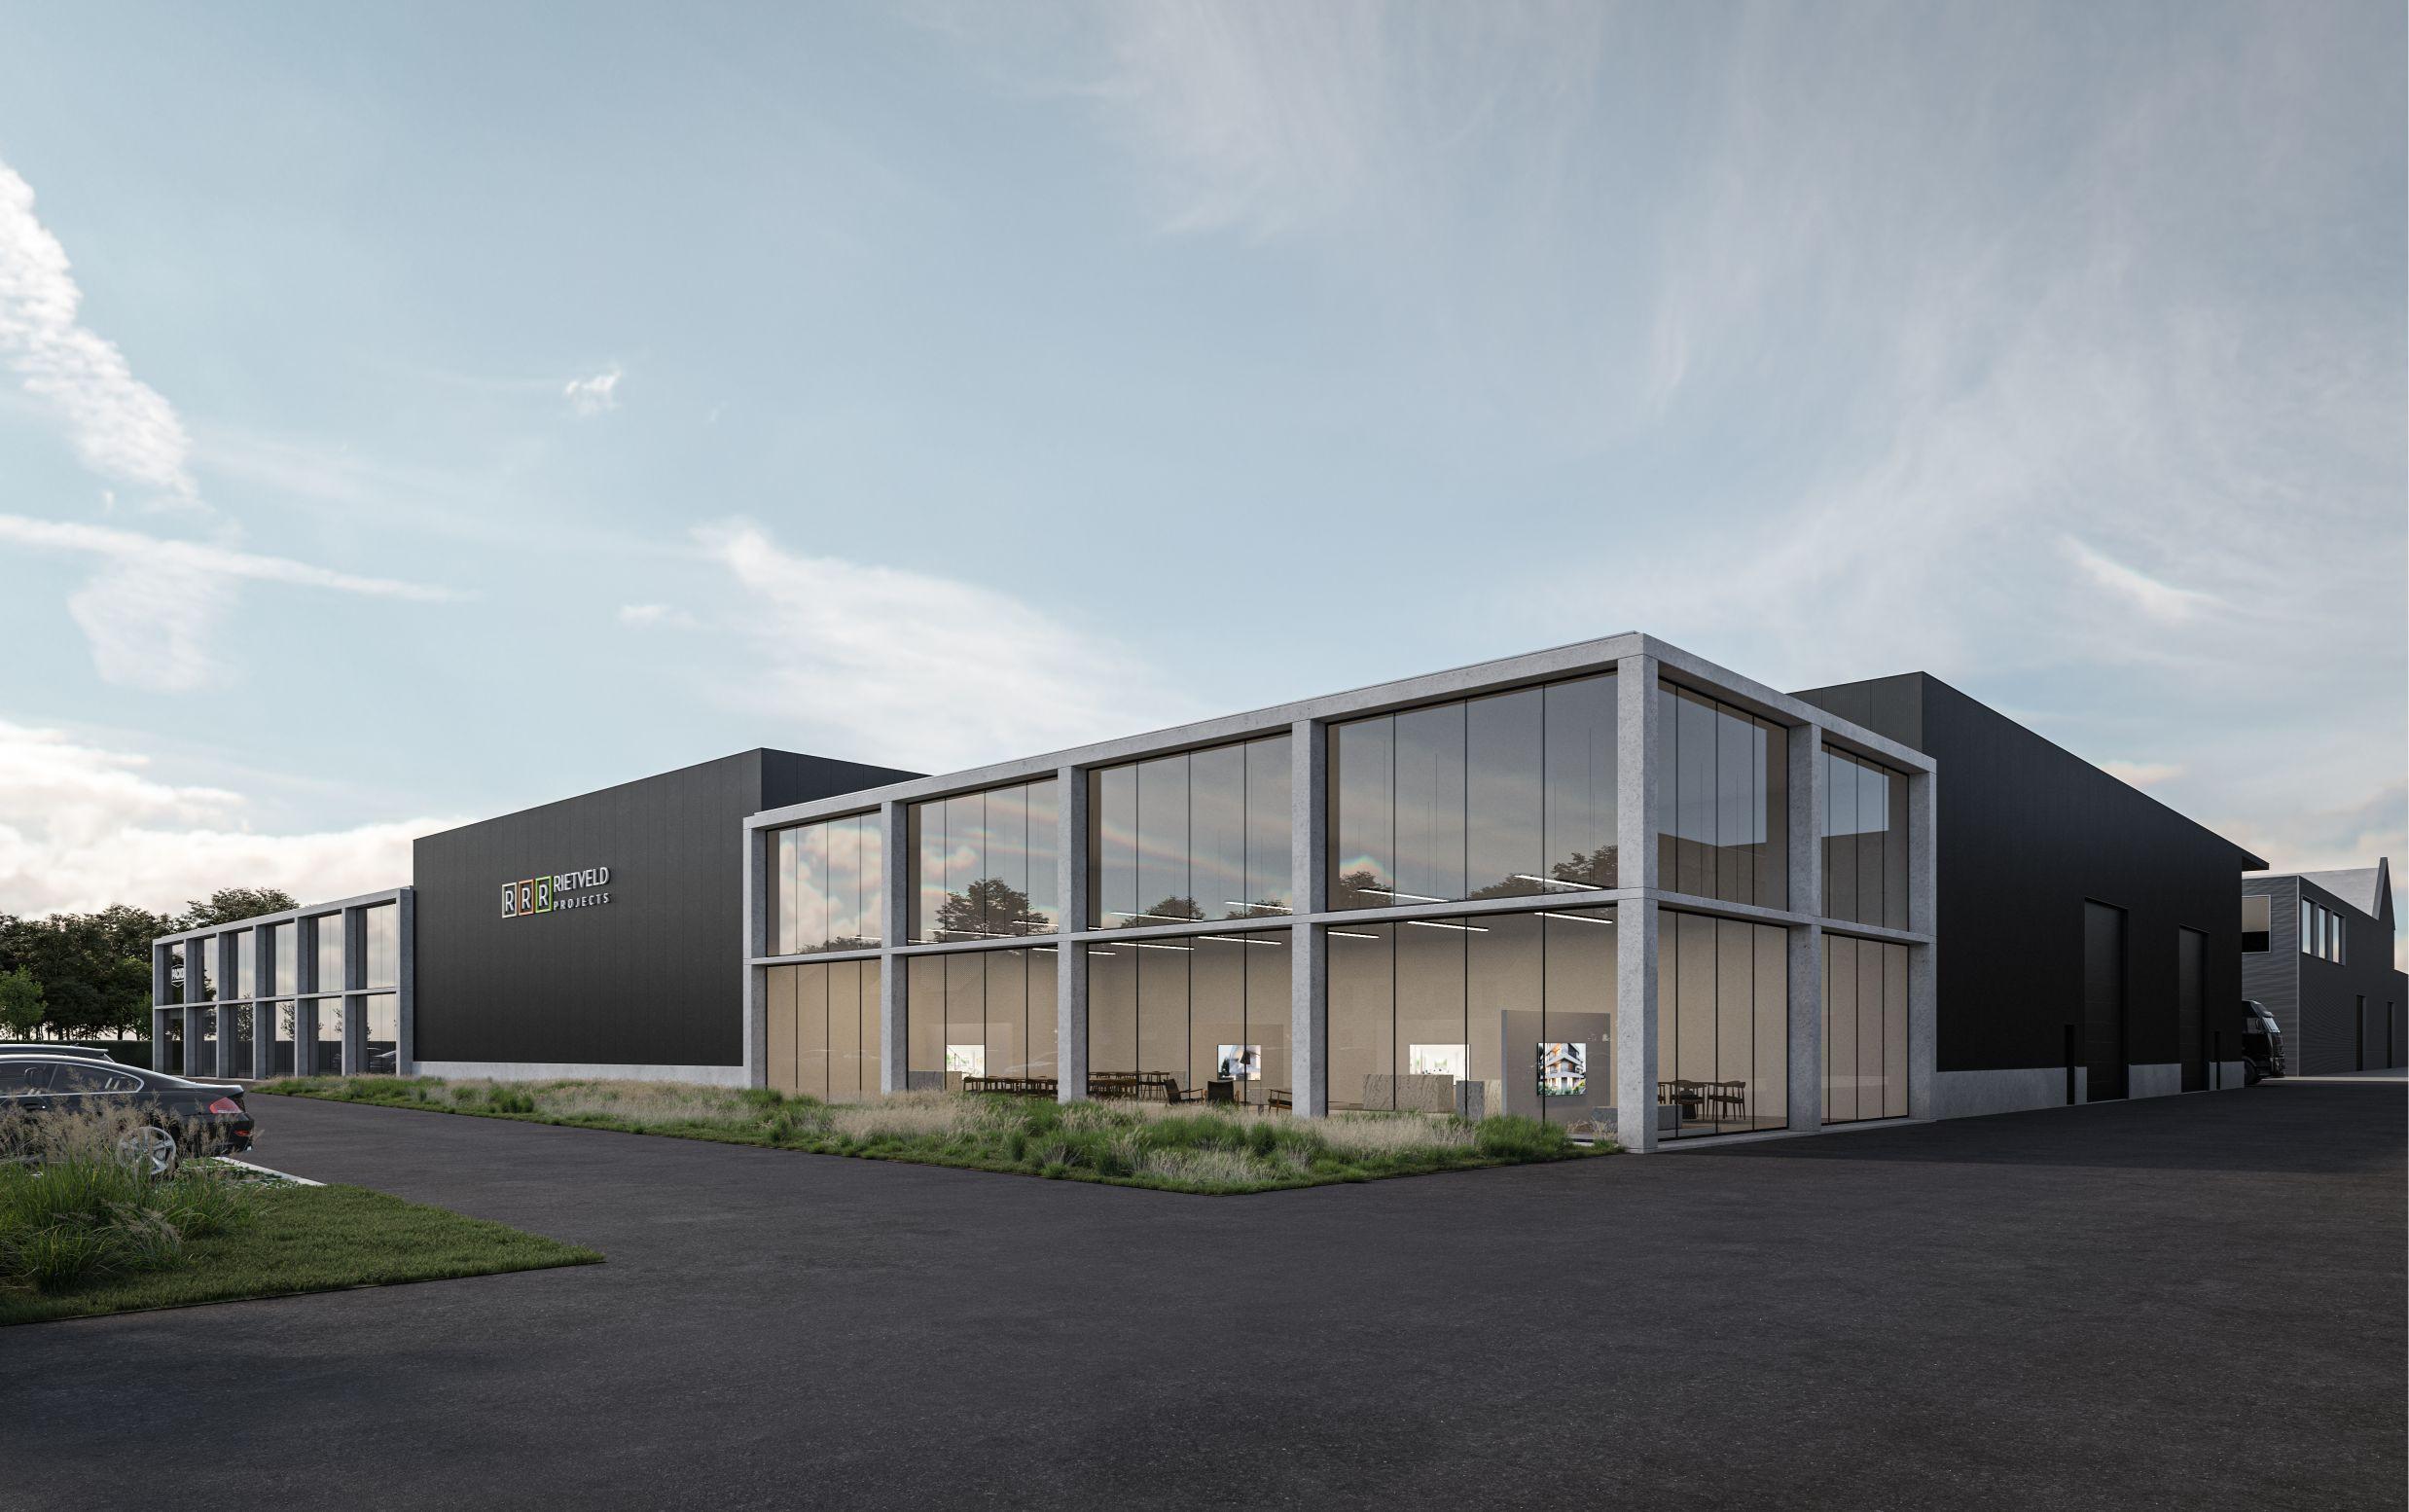 Rietveld Warehouses - Zedelgem Kuilputstraat 2.jpg